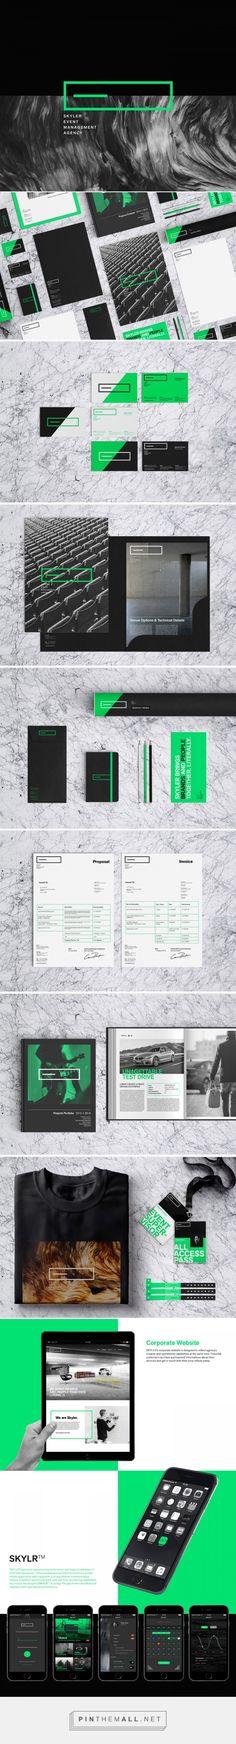 SKYLER Event Management Agency Branding by Samet K. | Fivestar Branding Agency – Design and Branding Agency & Curated Inspiration Gallery